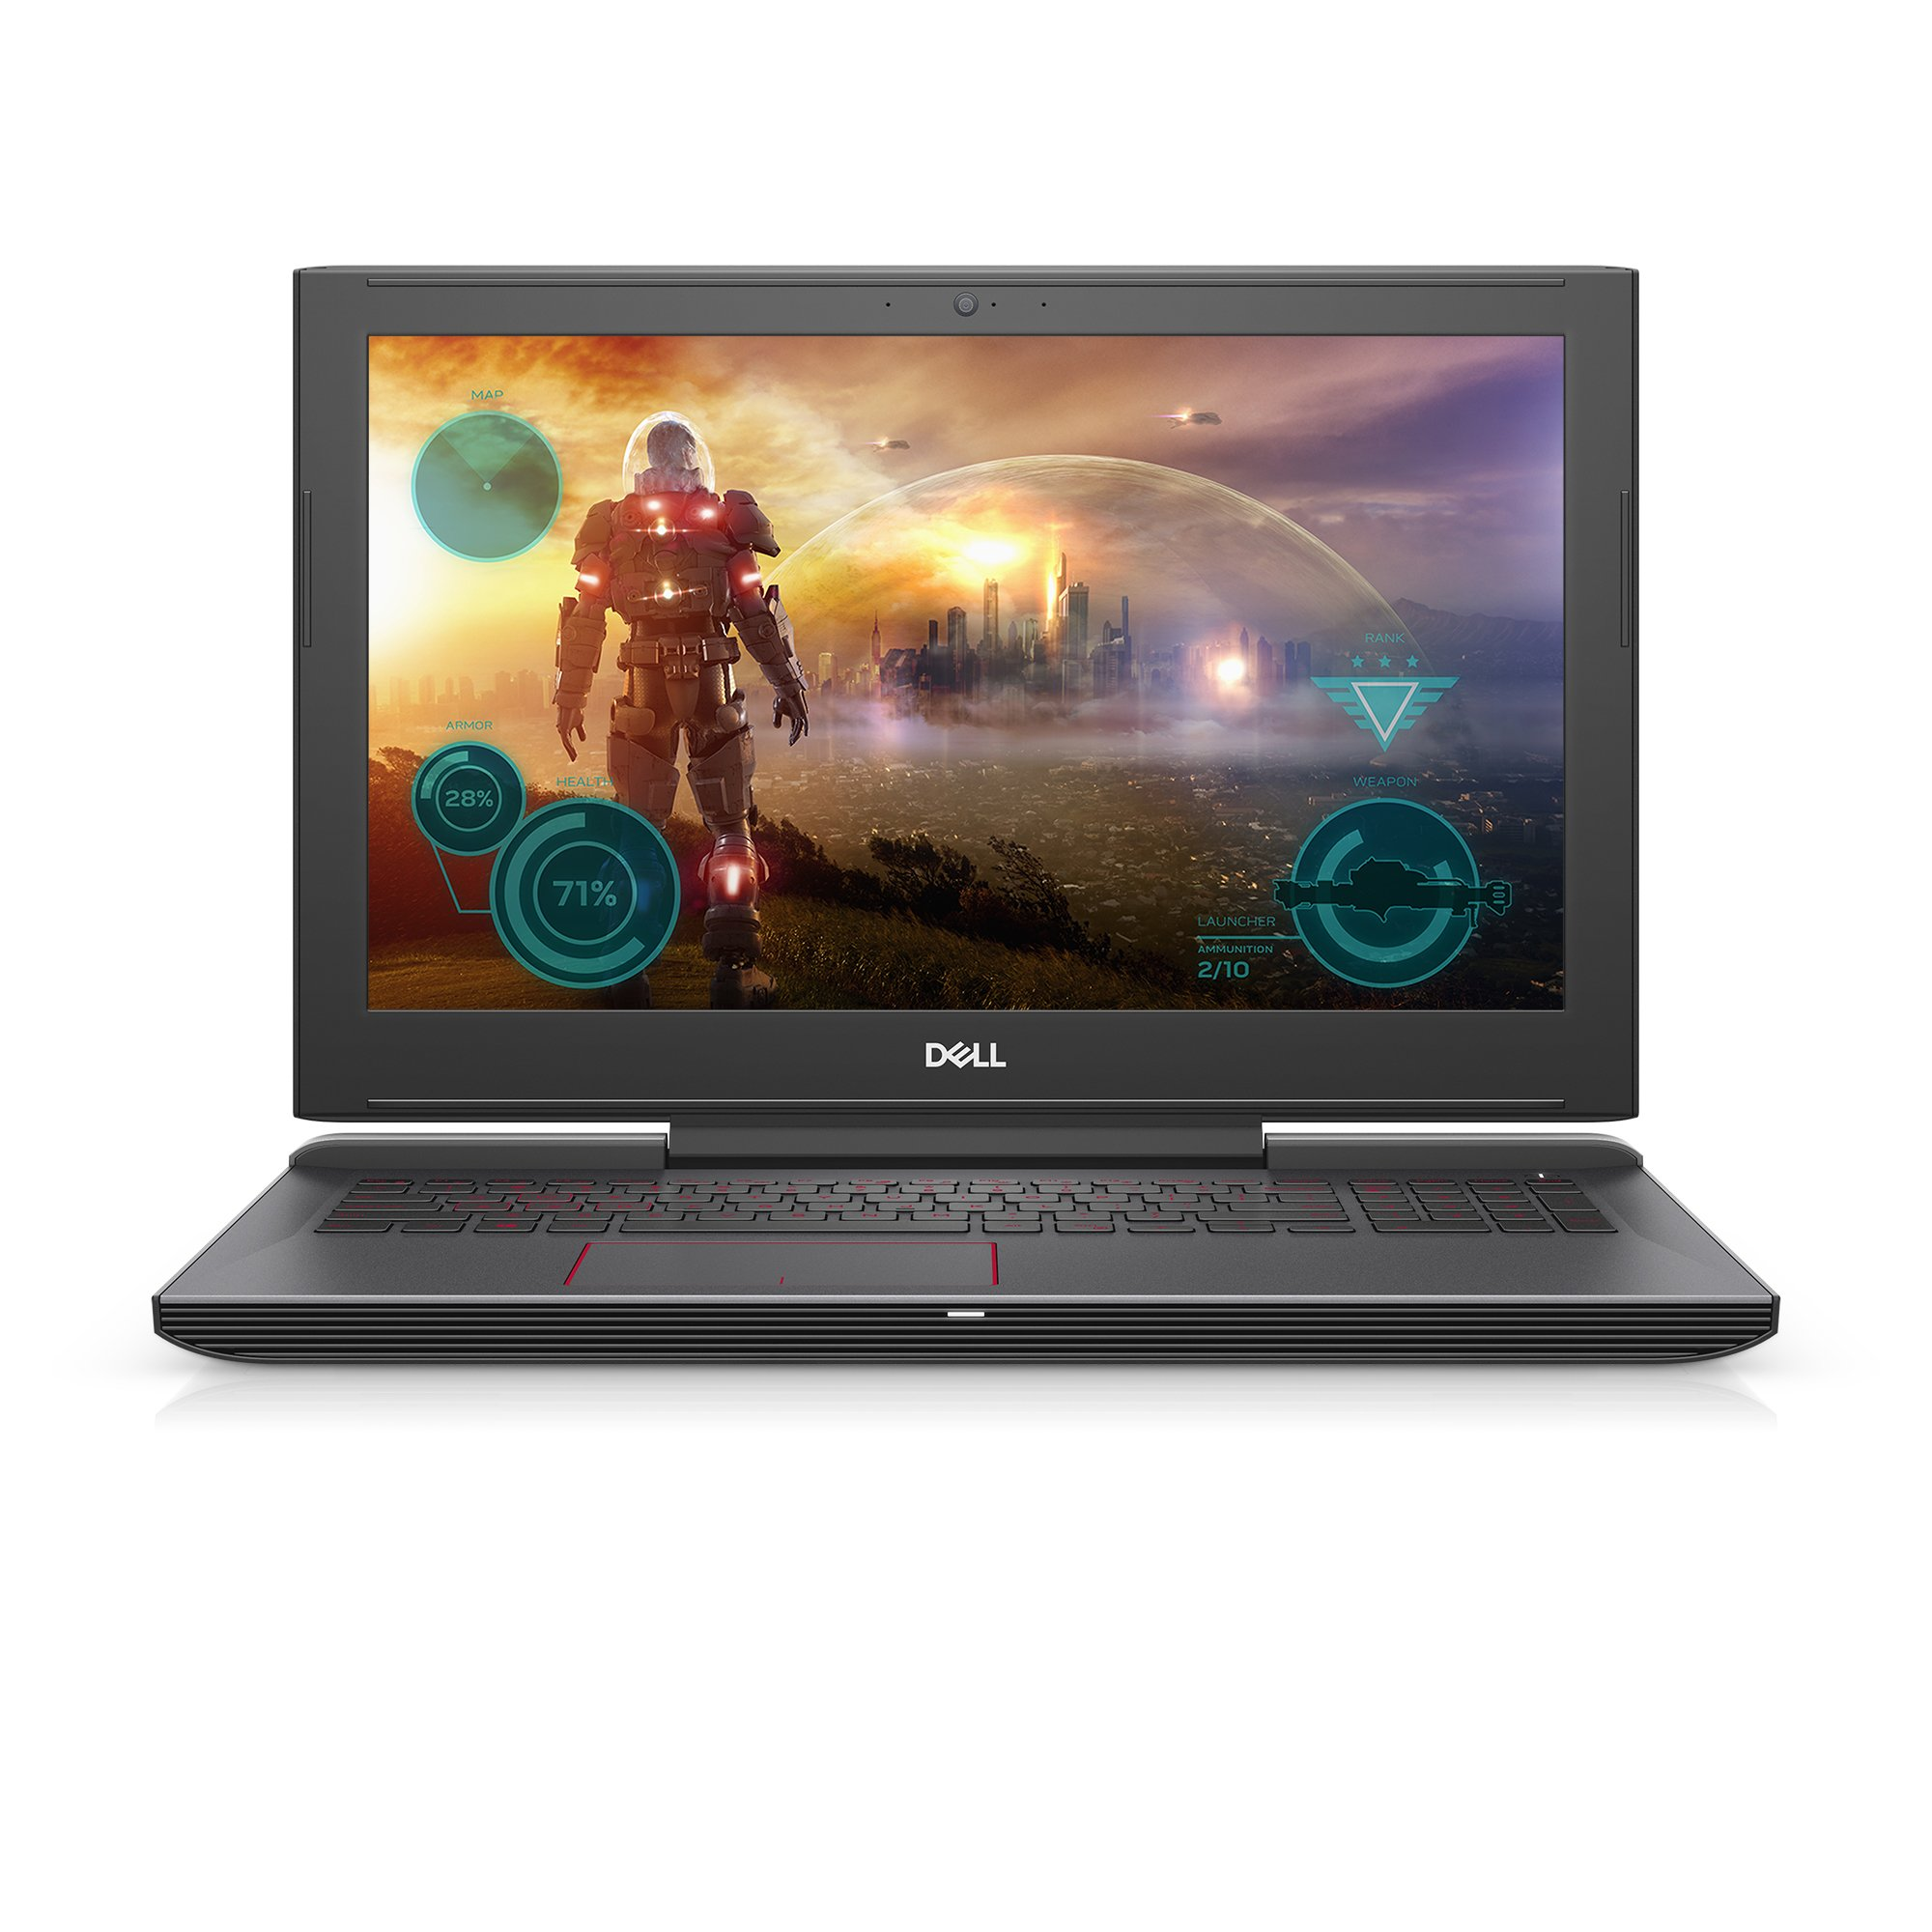 Dell G5587-7866BLK-PUS G5 15 5587 Gaming Laptop 15.6″ LED Display, 8th Gen Intel i7 Processor, 16GB Memory, 128GB SSD+1TB HDD, NVIDIA GeForce GTX 1050Ti, Licorice Black